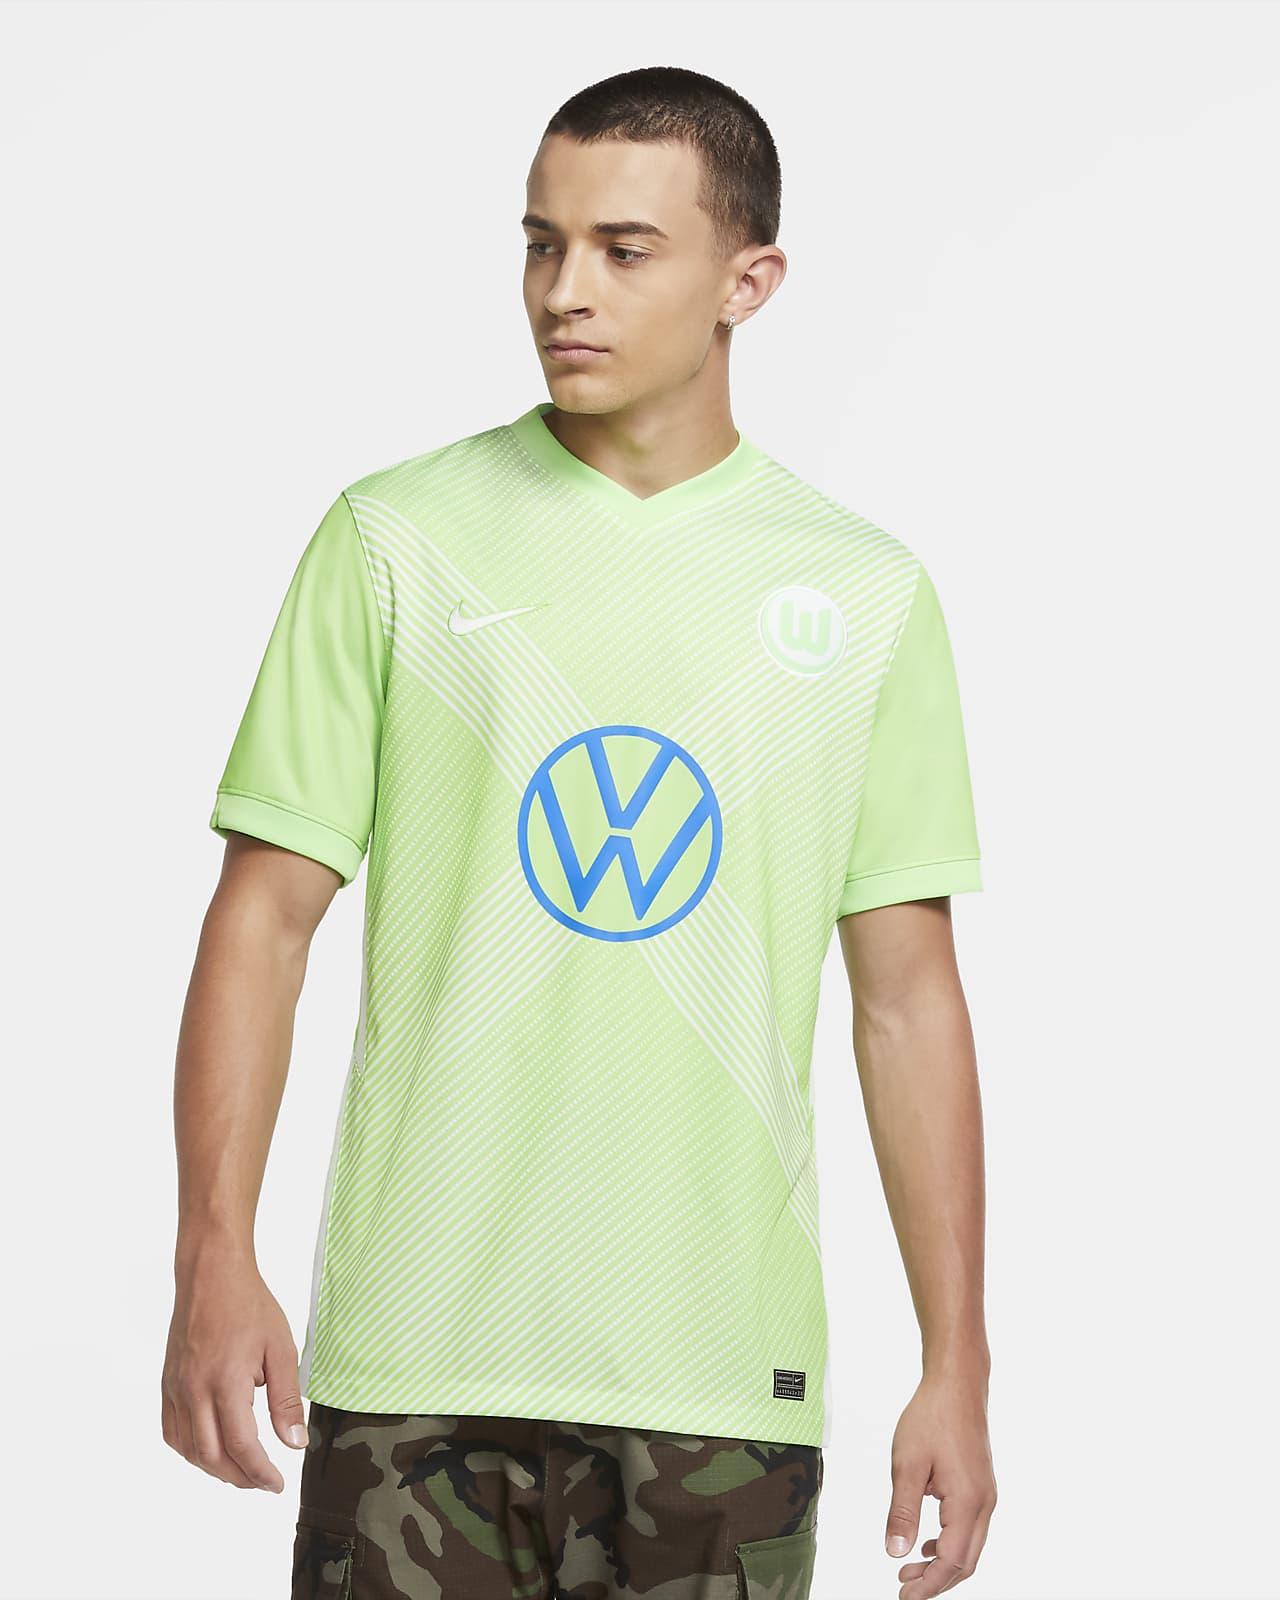 Maillot de football VfL Wolfsburg 2020/21 Stadium Domicile pour Homme